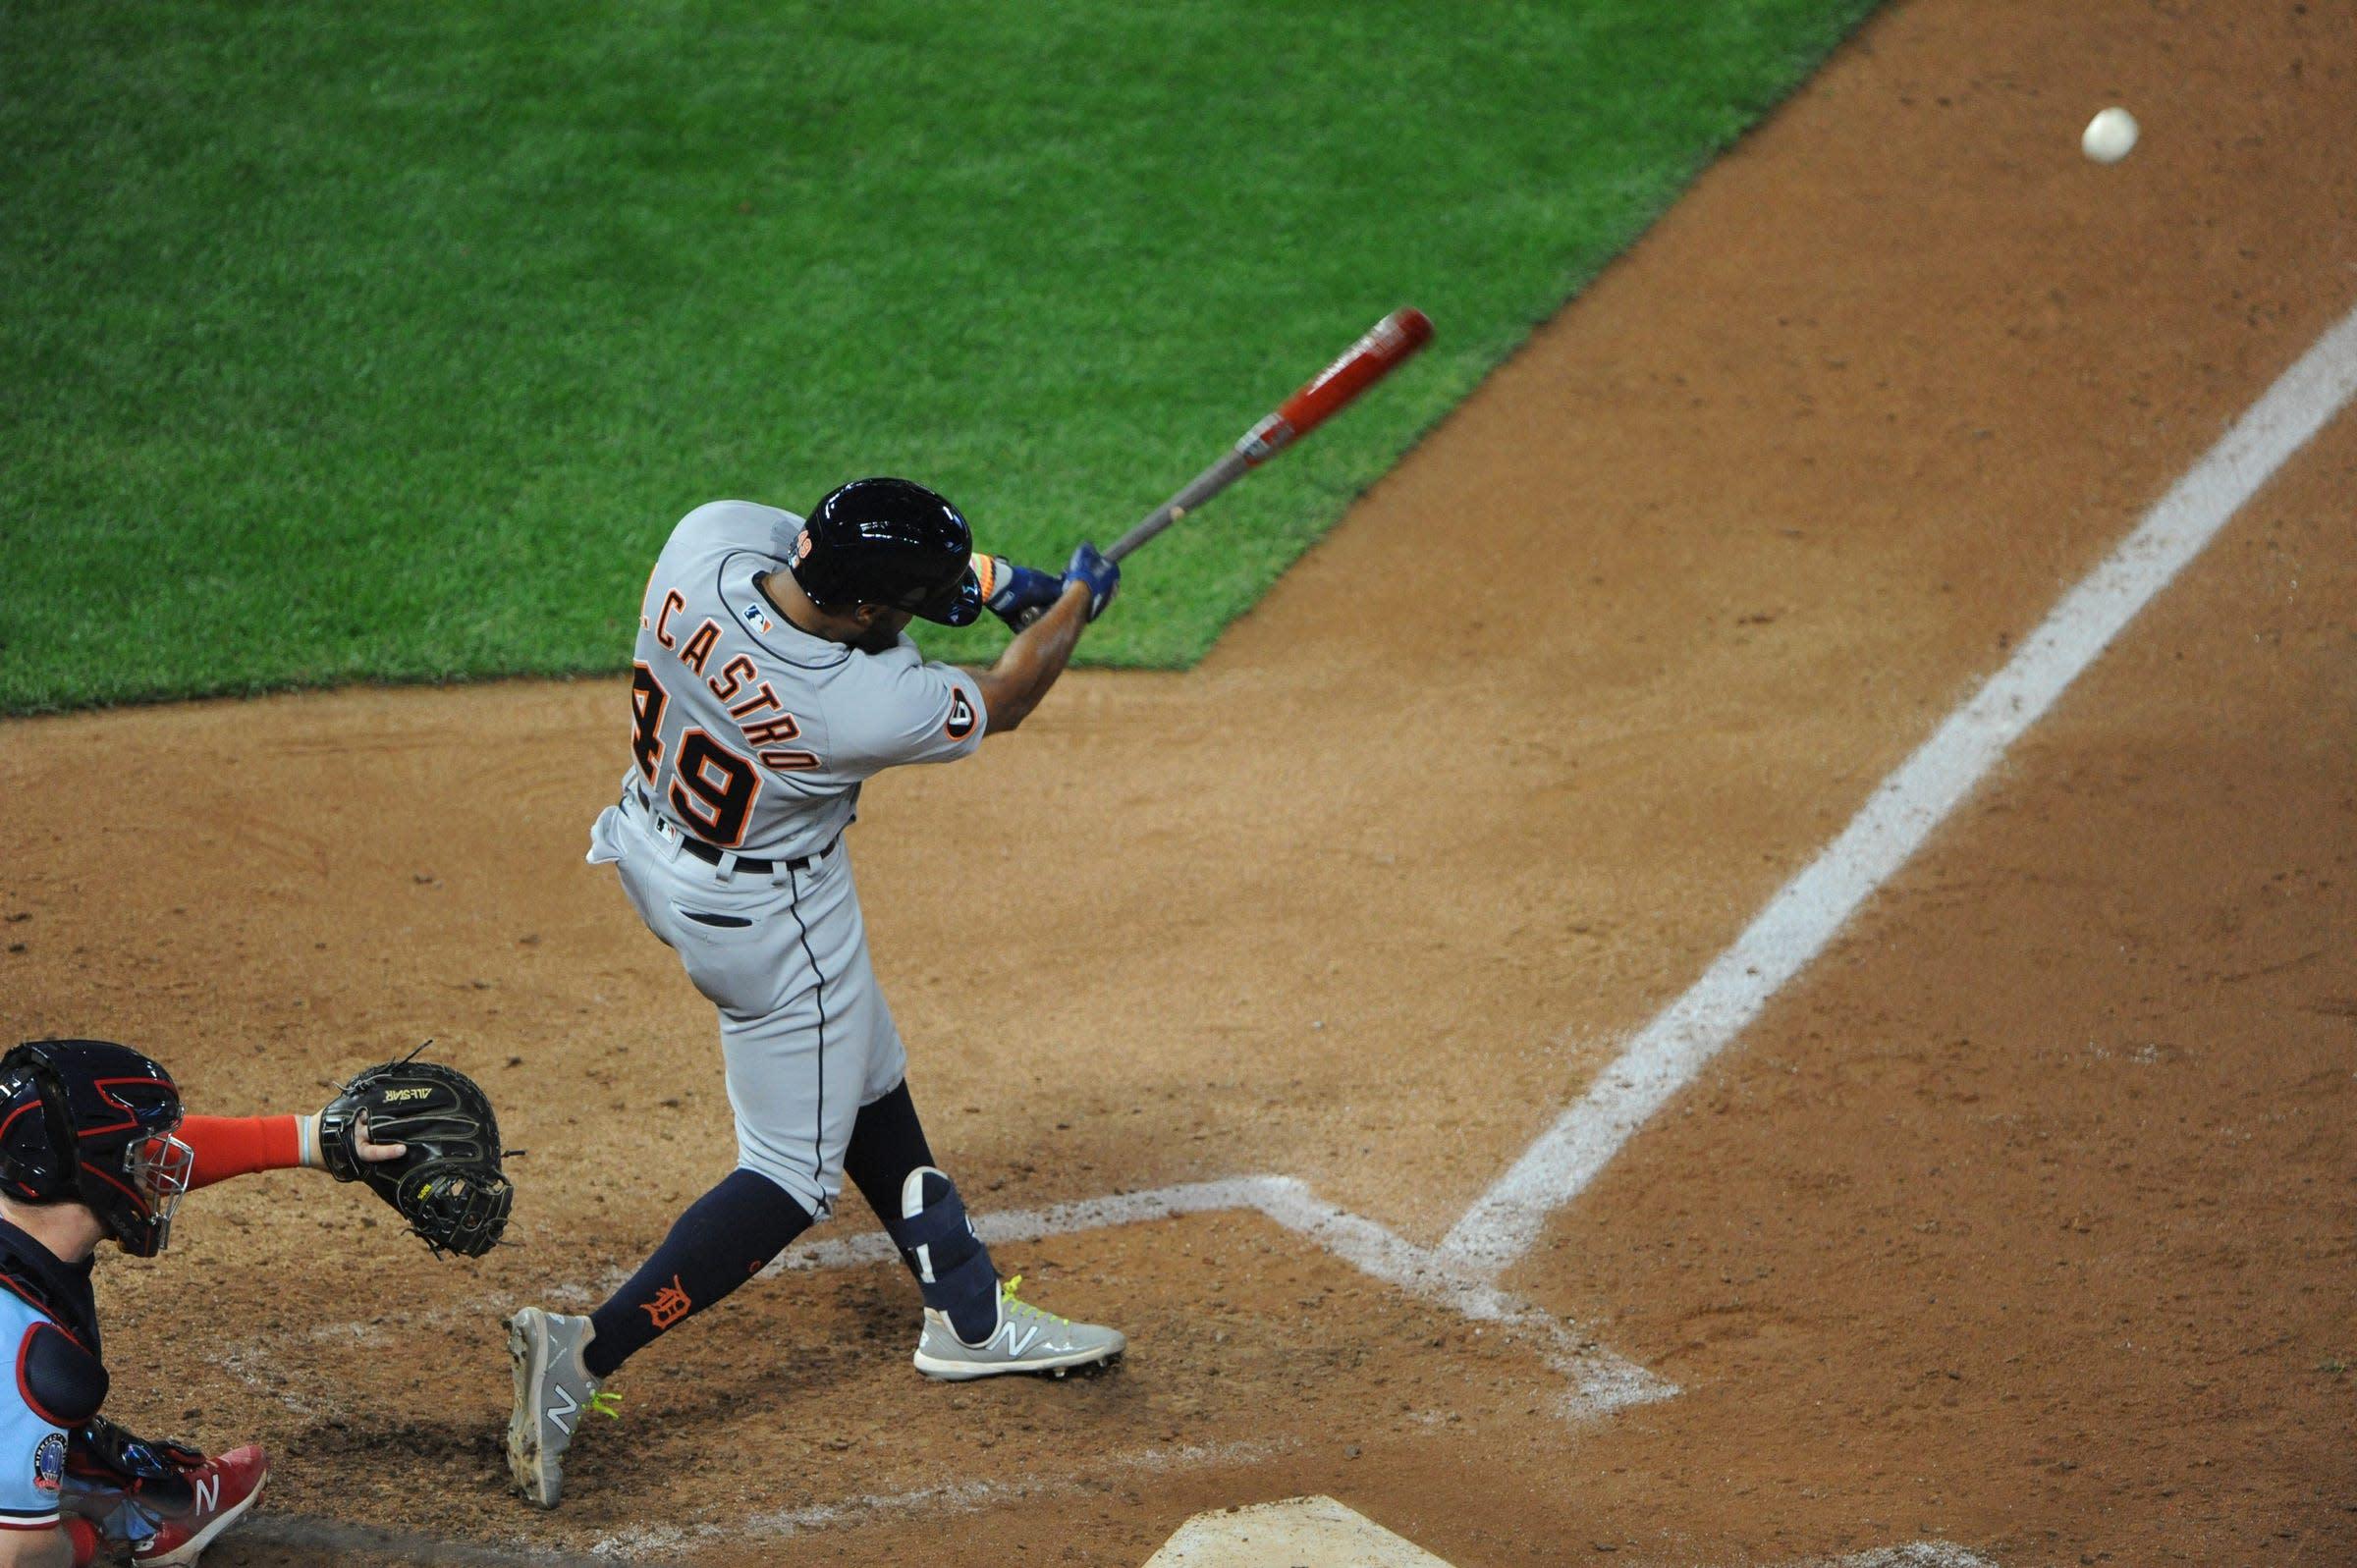 Detroit Tigers vs. Kansas City Royals: Tigers drop series opener, 8-7